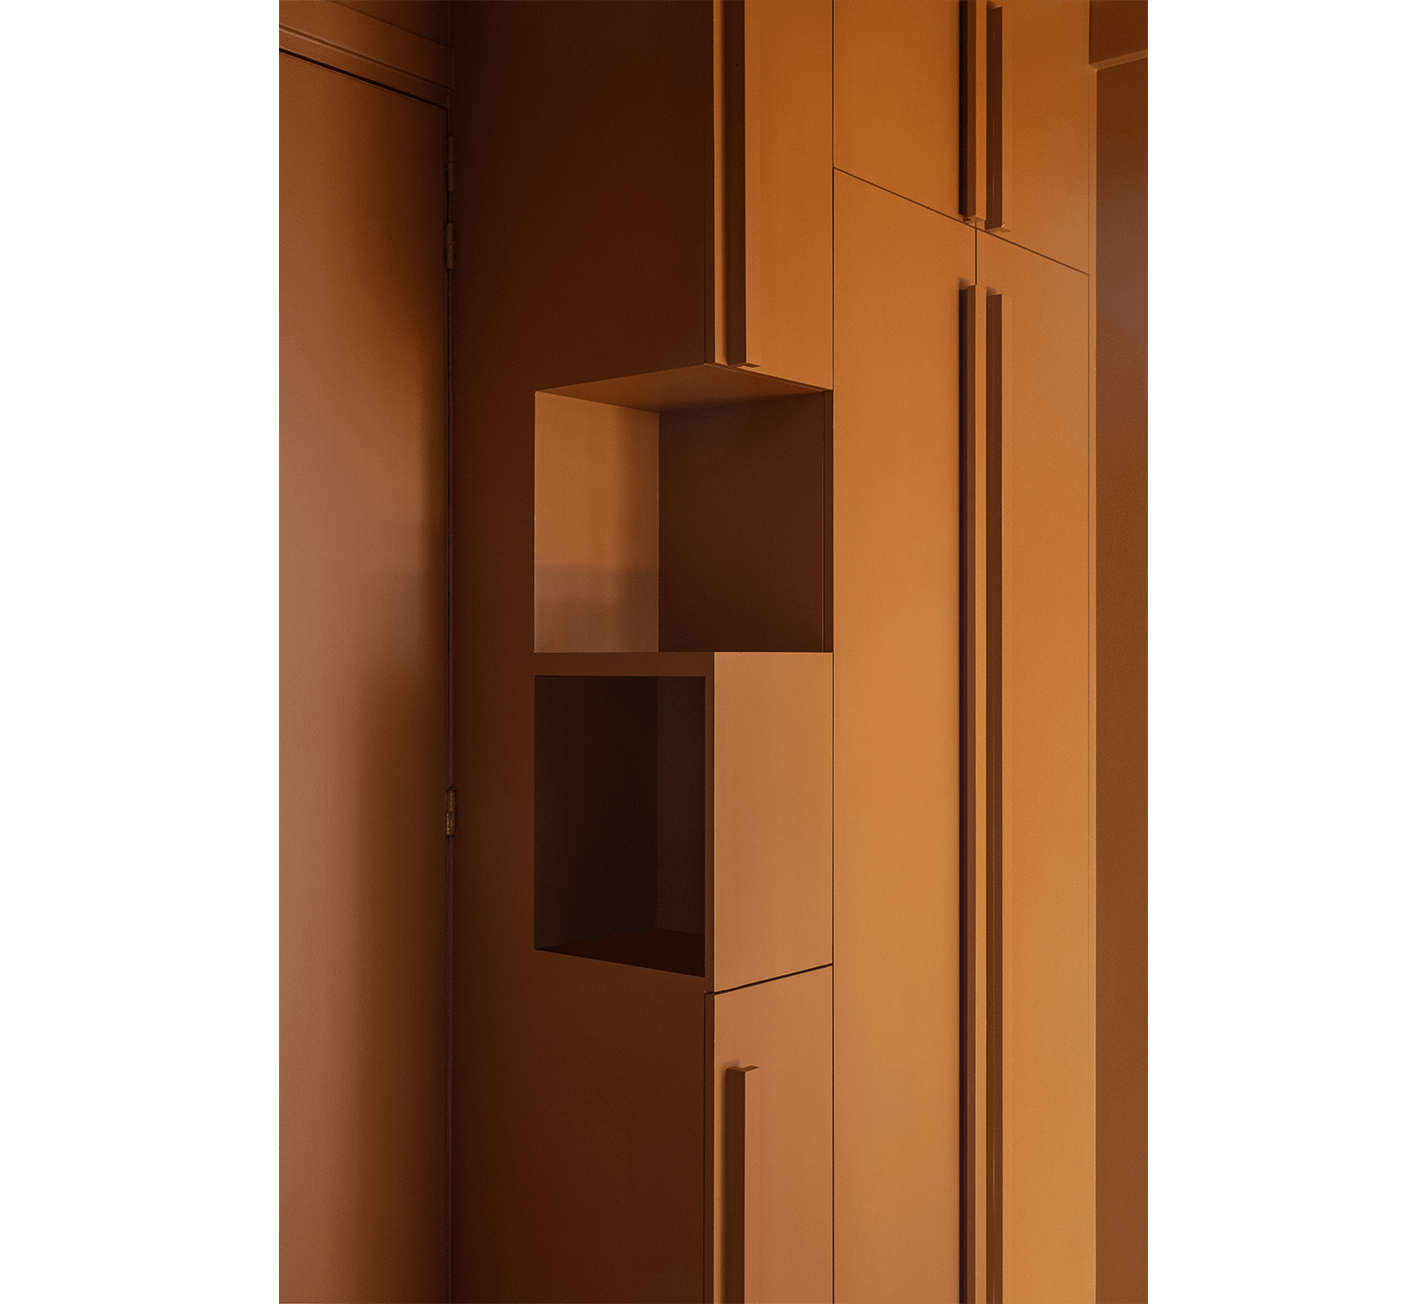 Projet-Emile-Atelier-Steve-Pauline-Borgia-Architecte-interieur-07-min